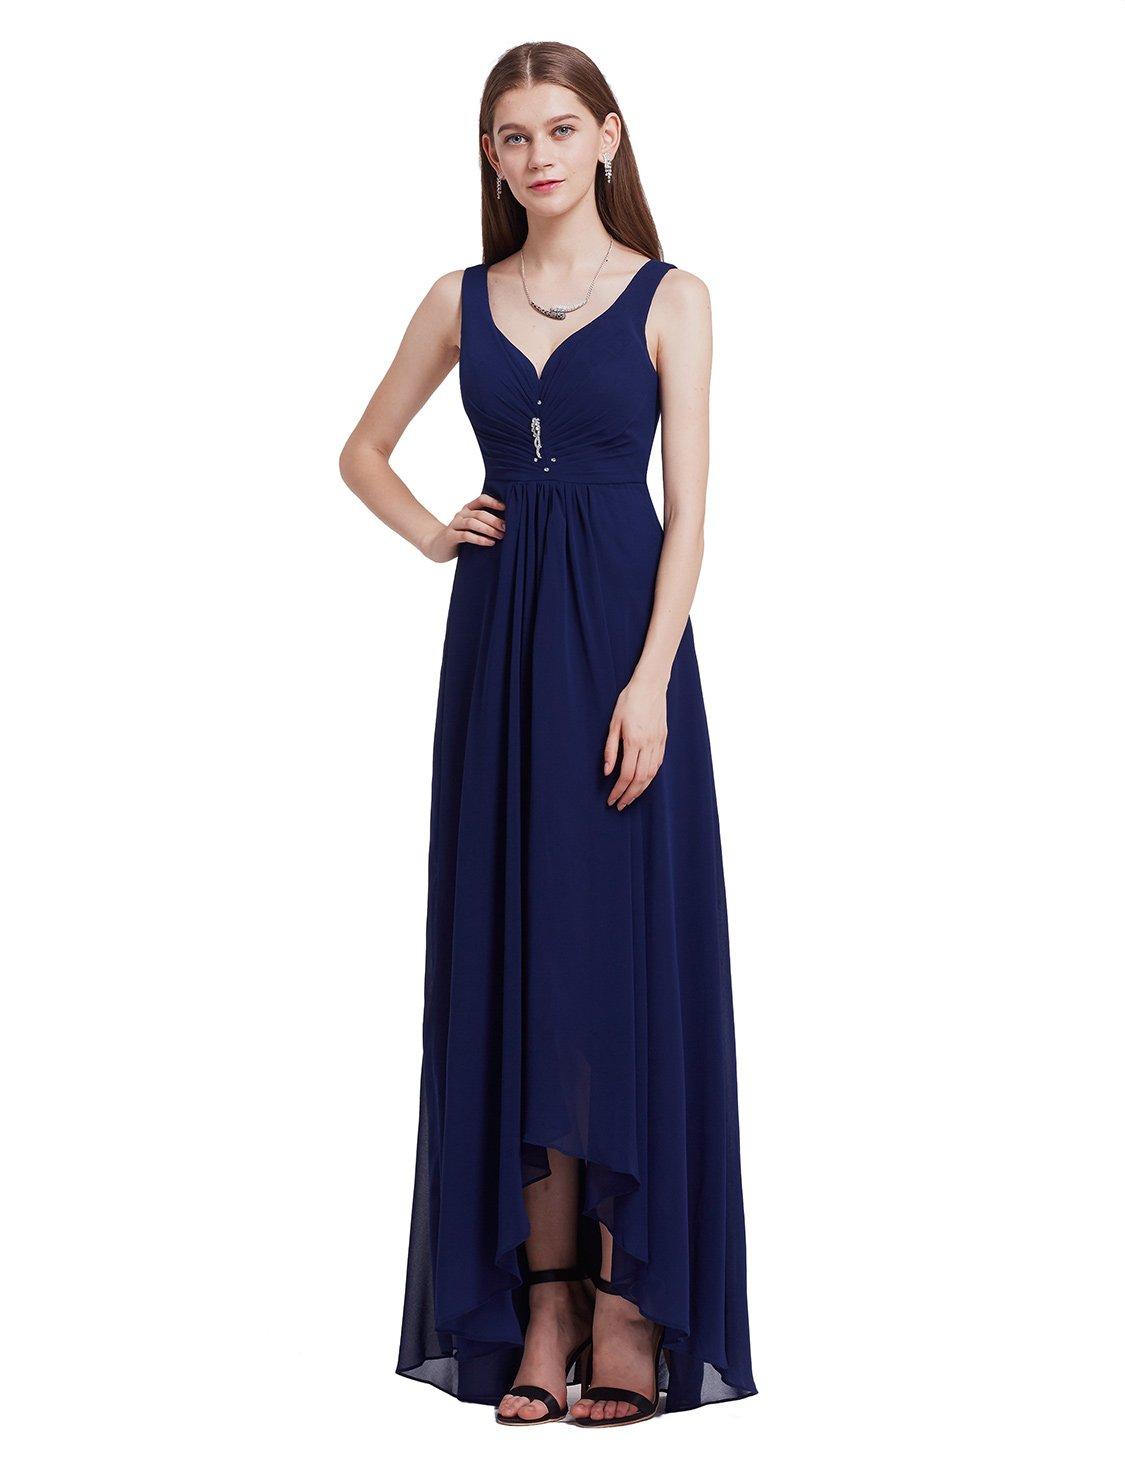 Ever-Pretty Womens Formal Black Tie Affair Dress 12 US Navy Blue